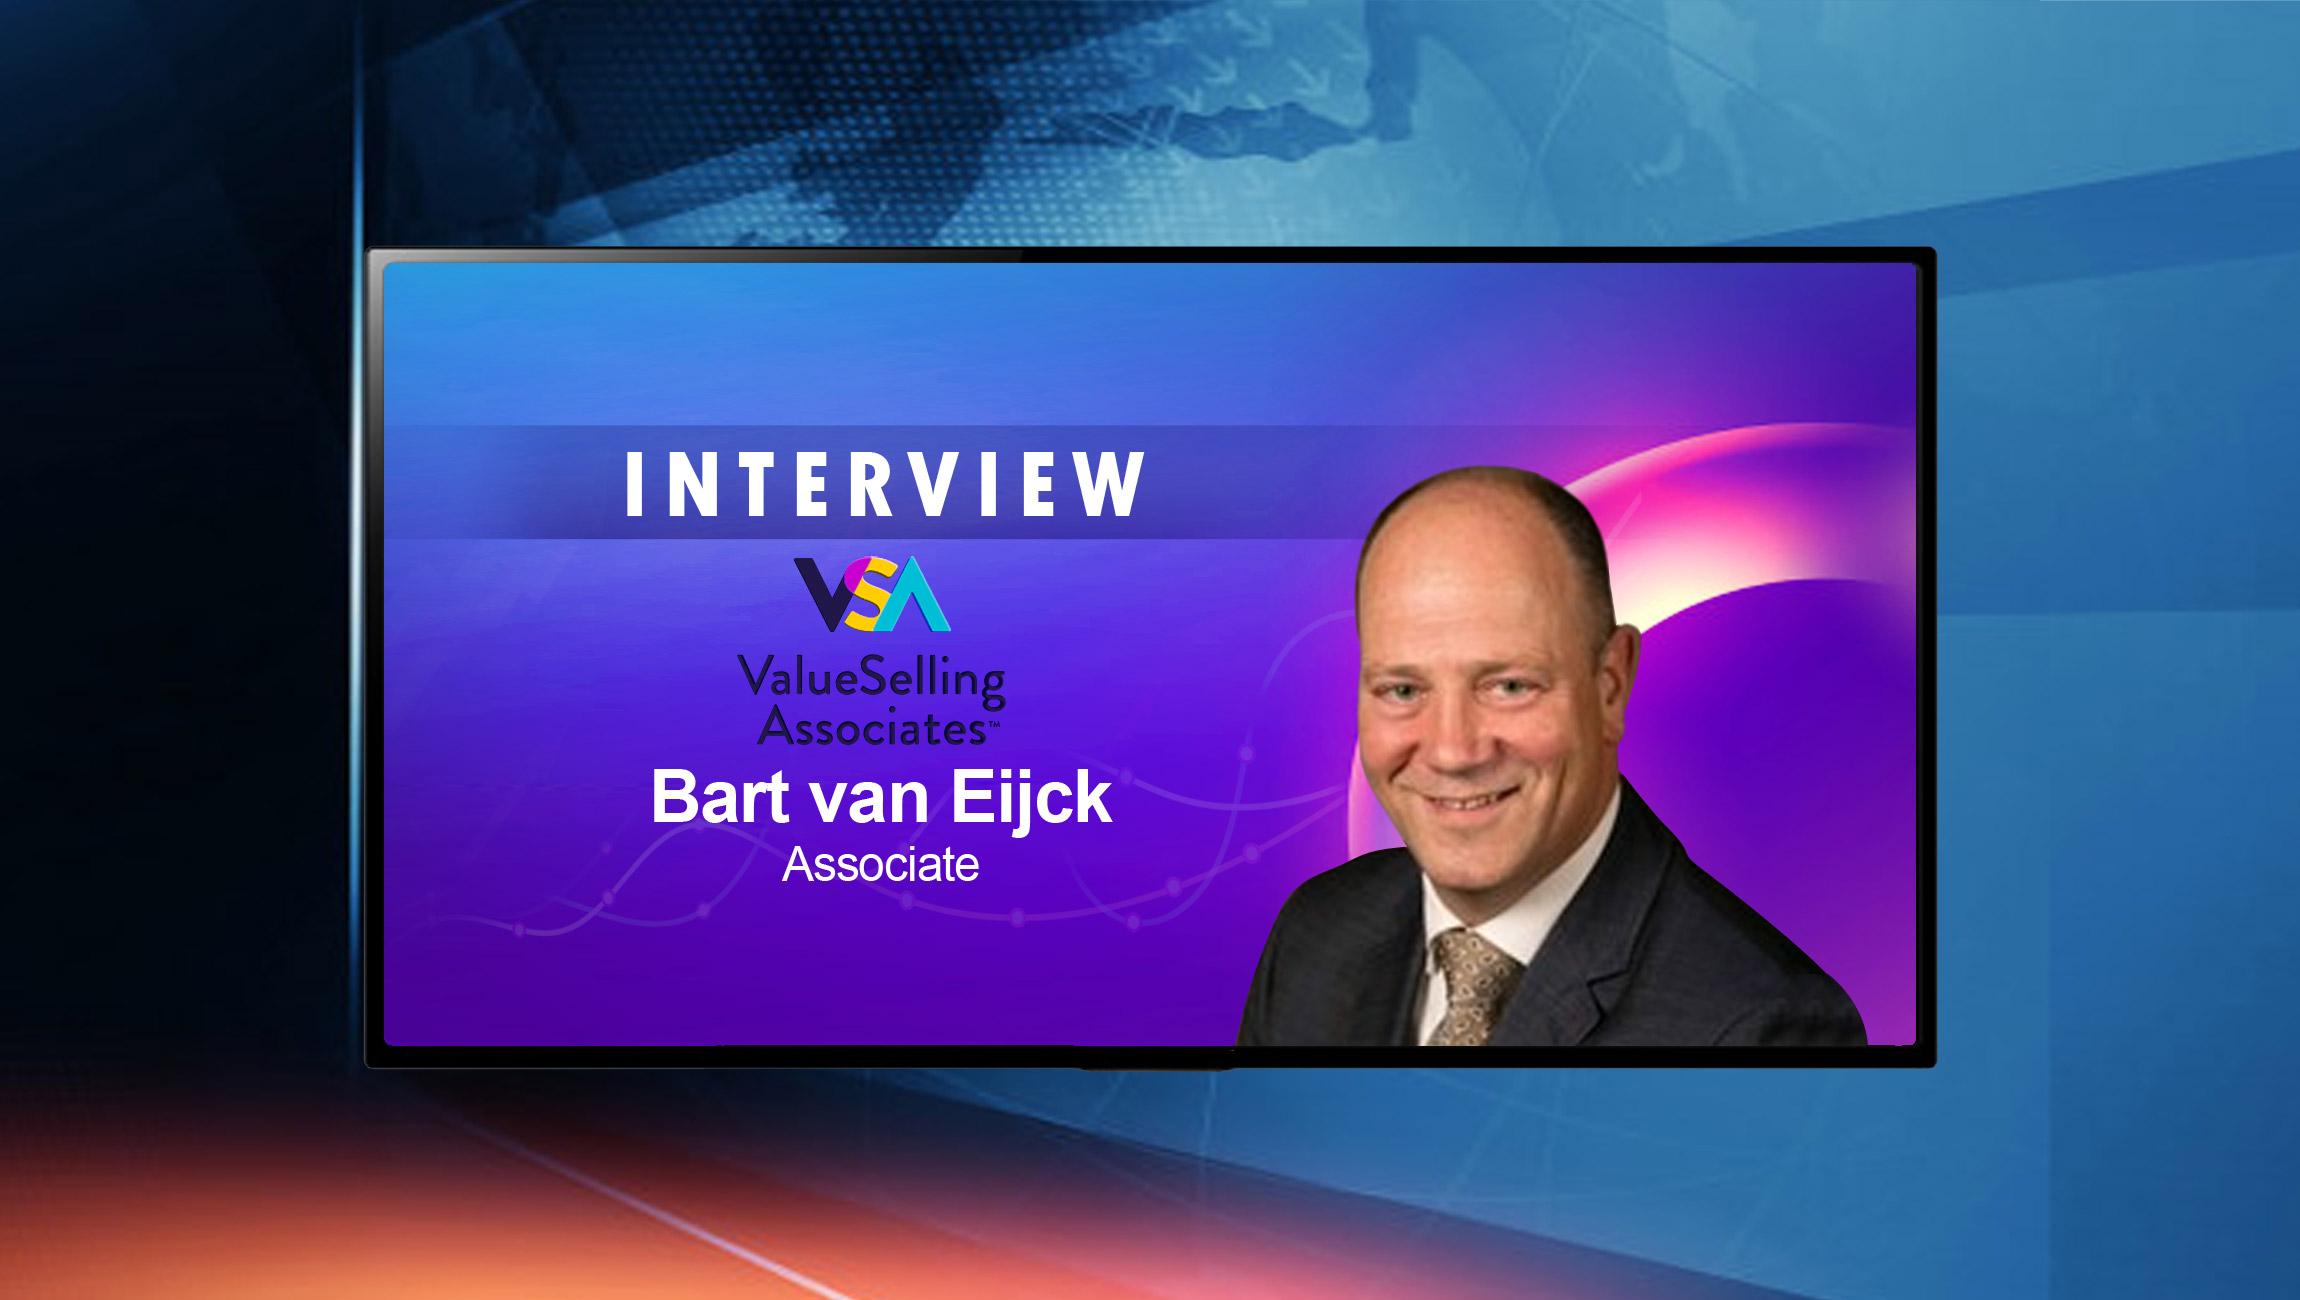 SalesTechStar Interview with Bart van Eijck, Associate at Value Selling